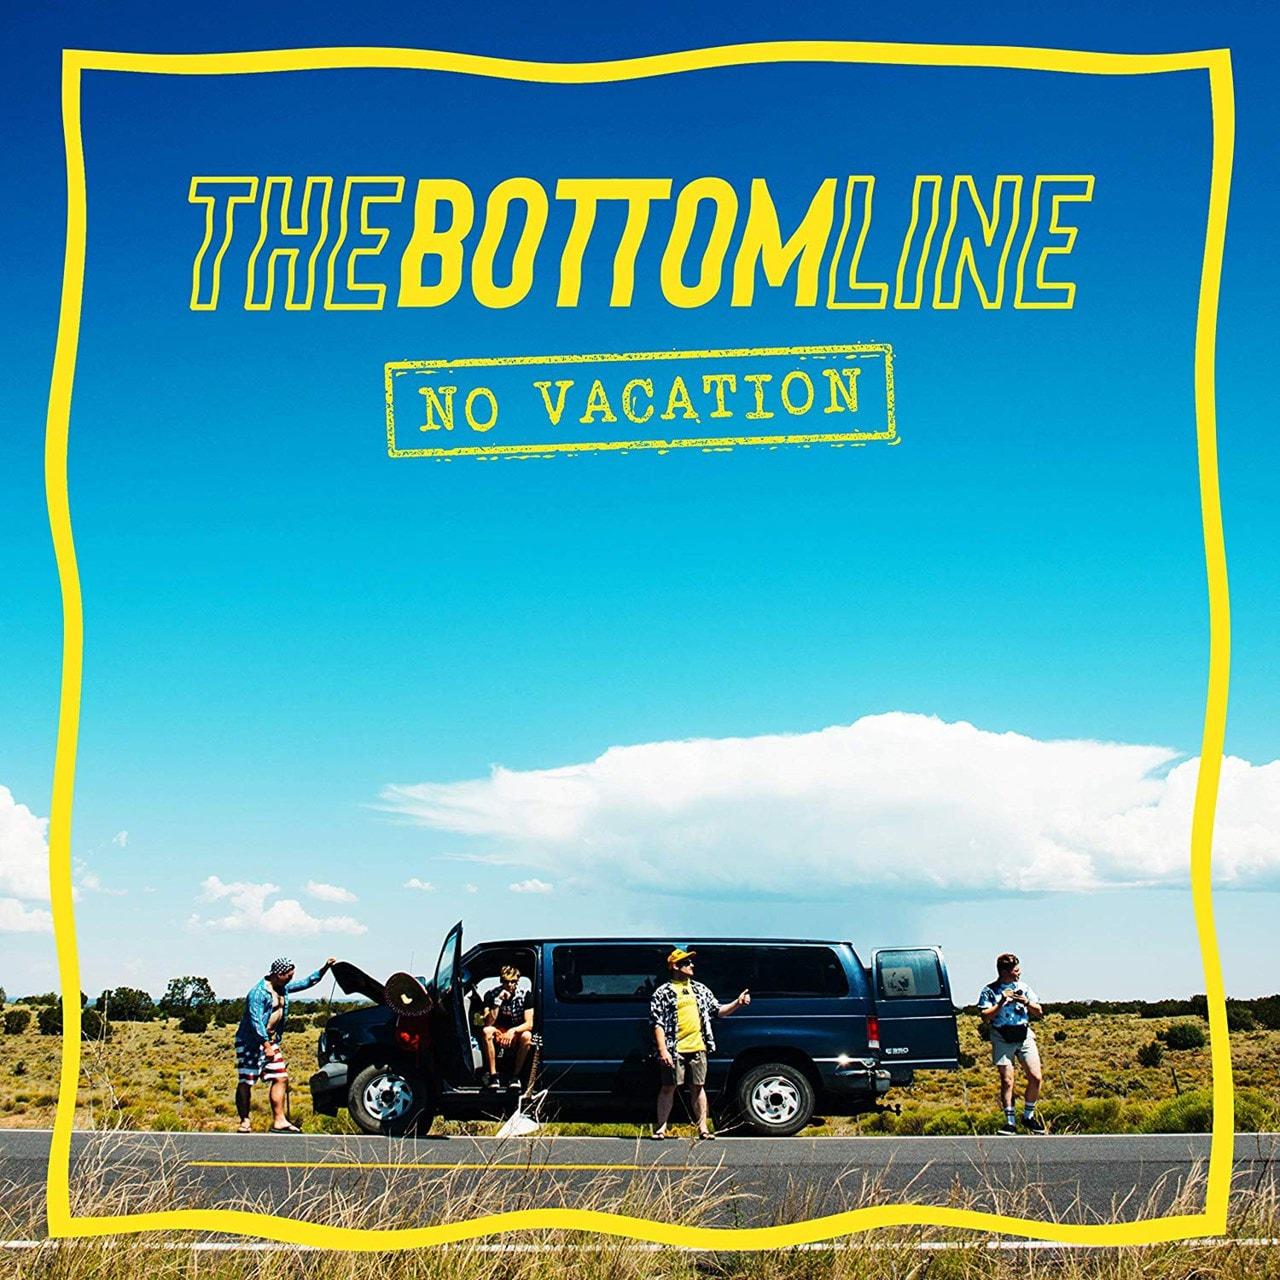 No Vacation - 1